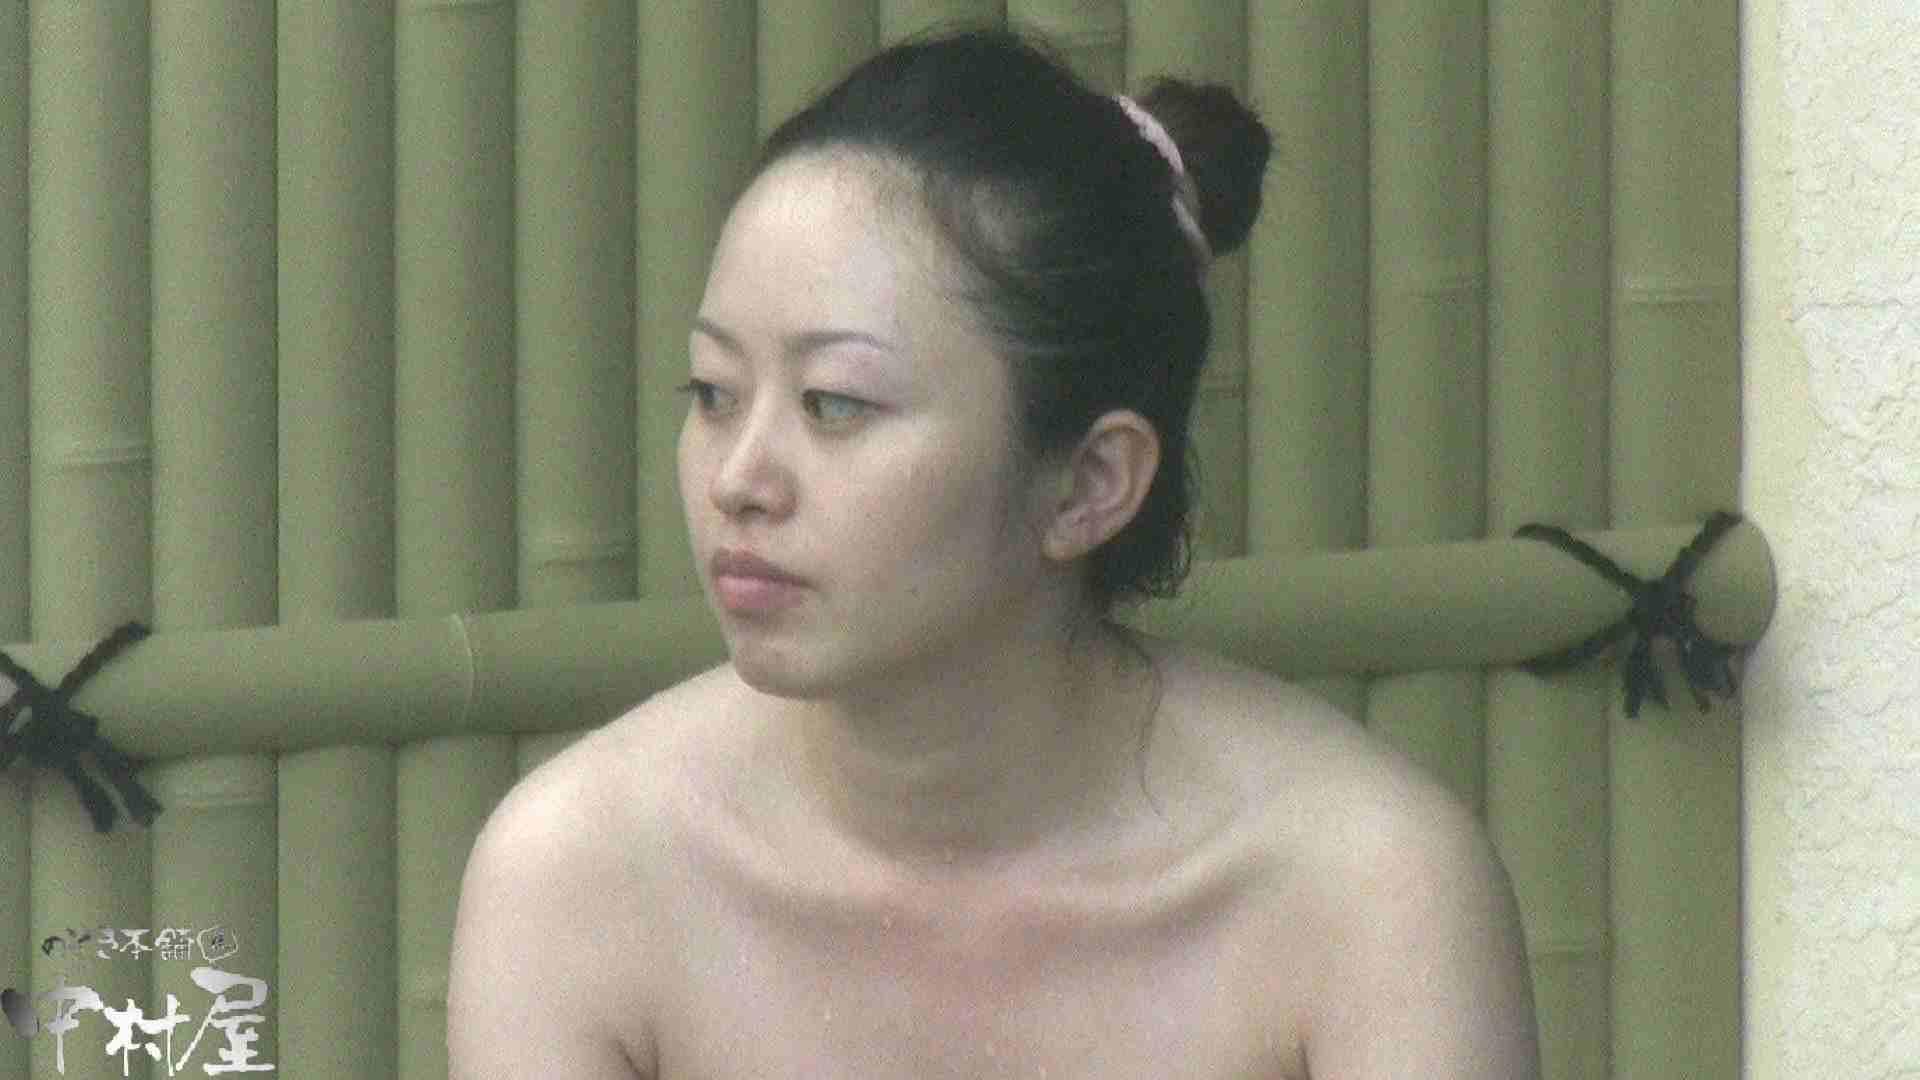 Aquaな露天風呂Vol.912 0 | 0  90連発 43